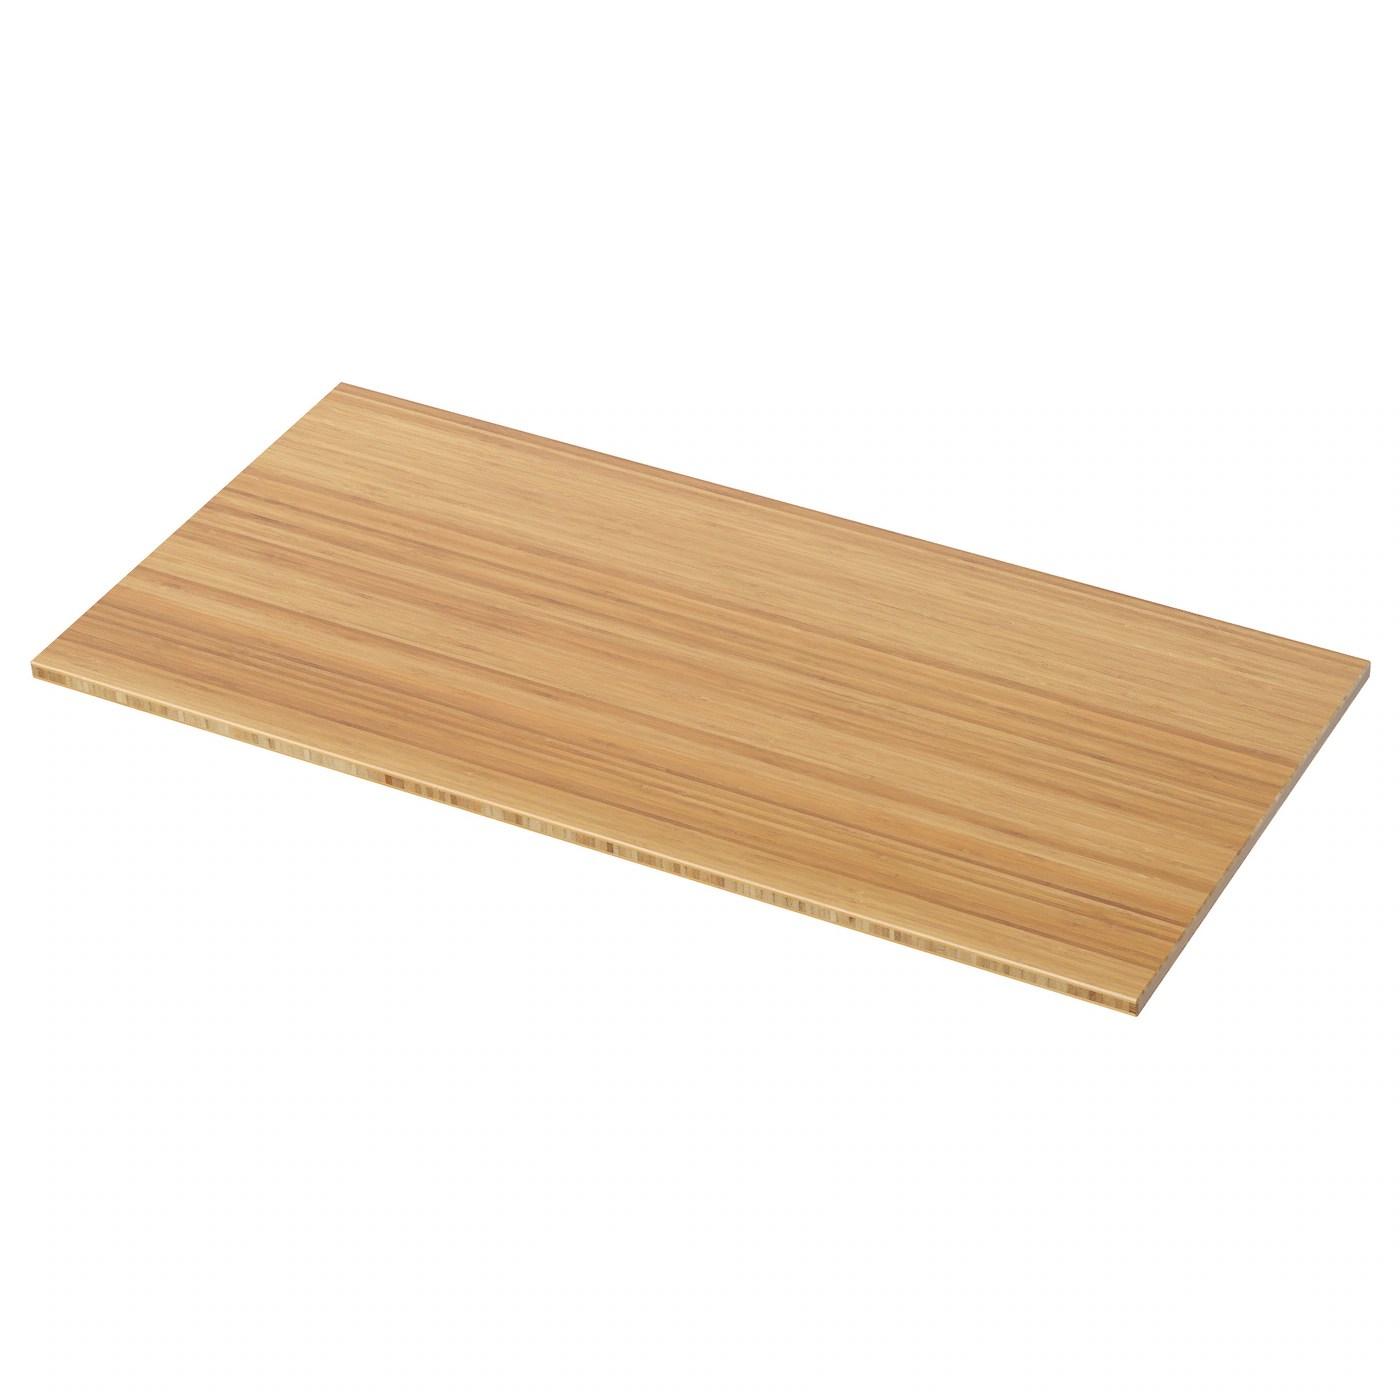 Tolken Plateau Bambou 102x49 Cm Materiau Durable Ikea